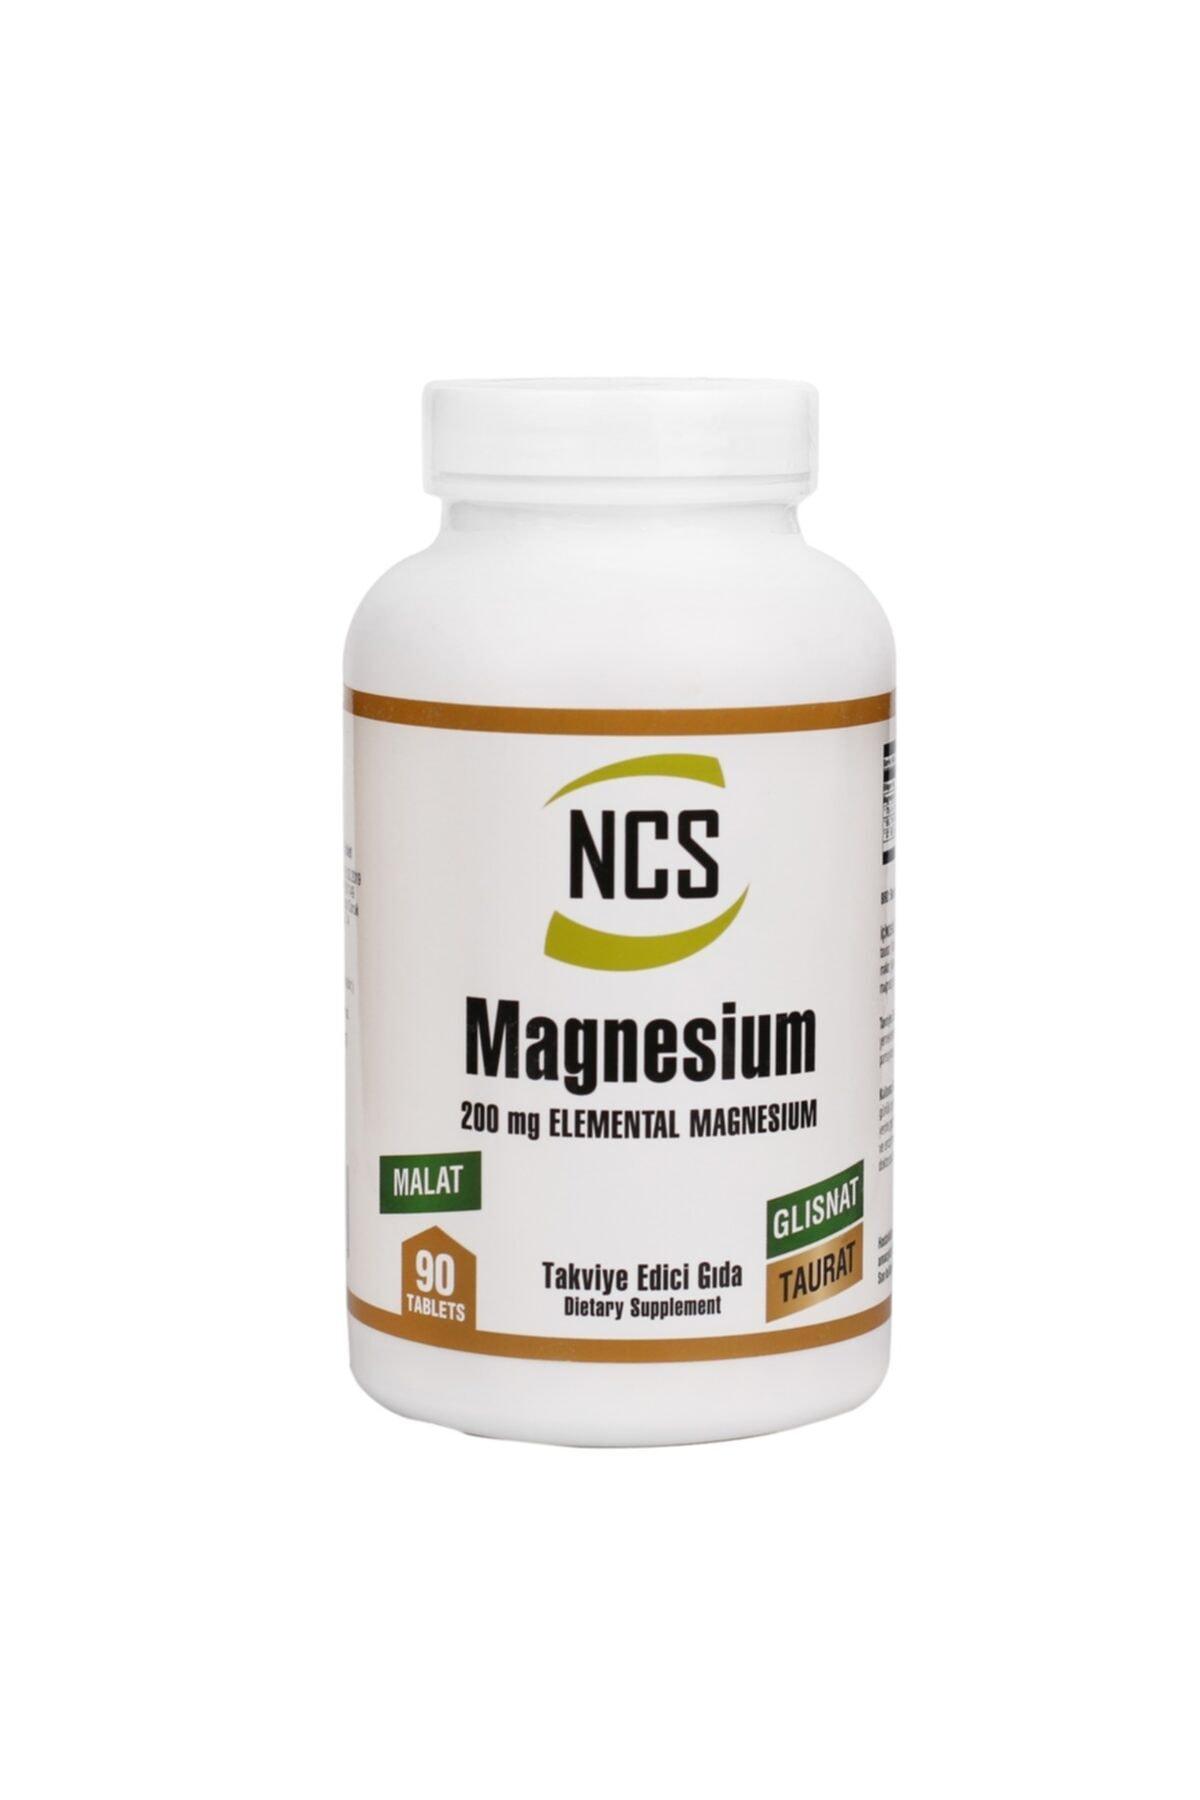 NCS Magnezyum Bisglinisat Taurat Malat 200 Mg 90 Tablet 1